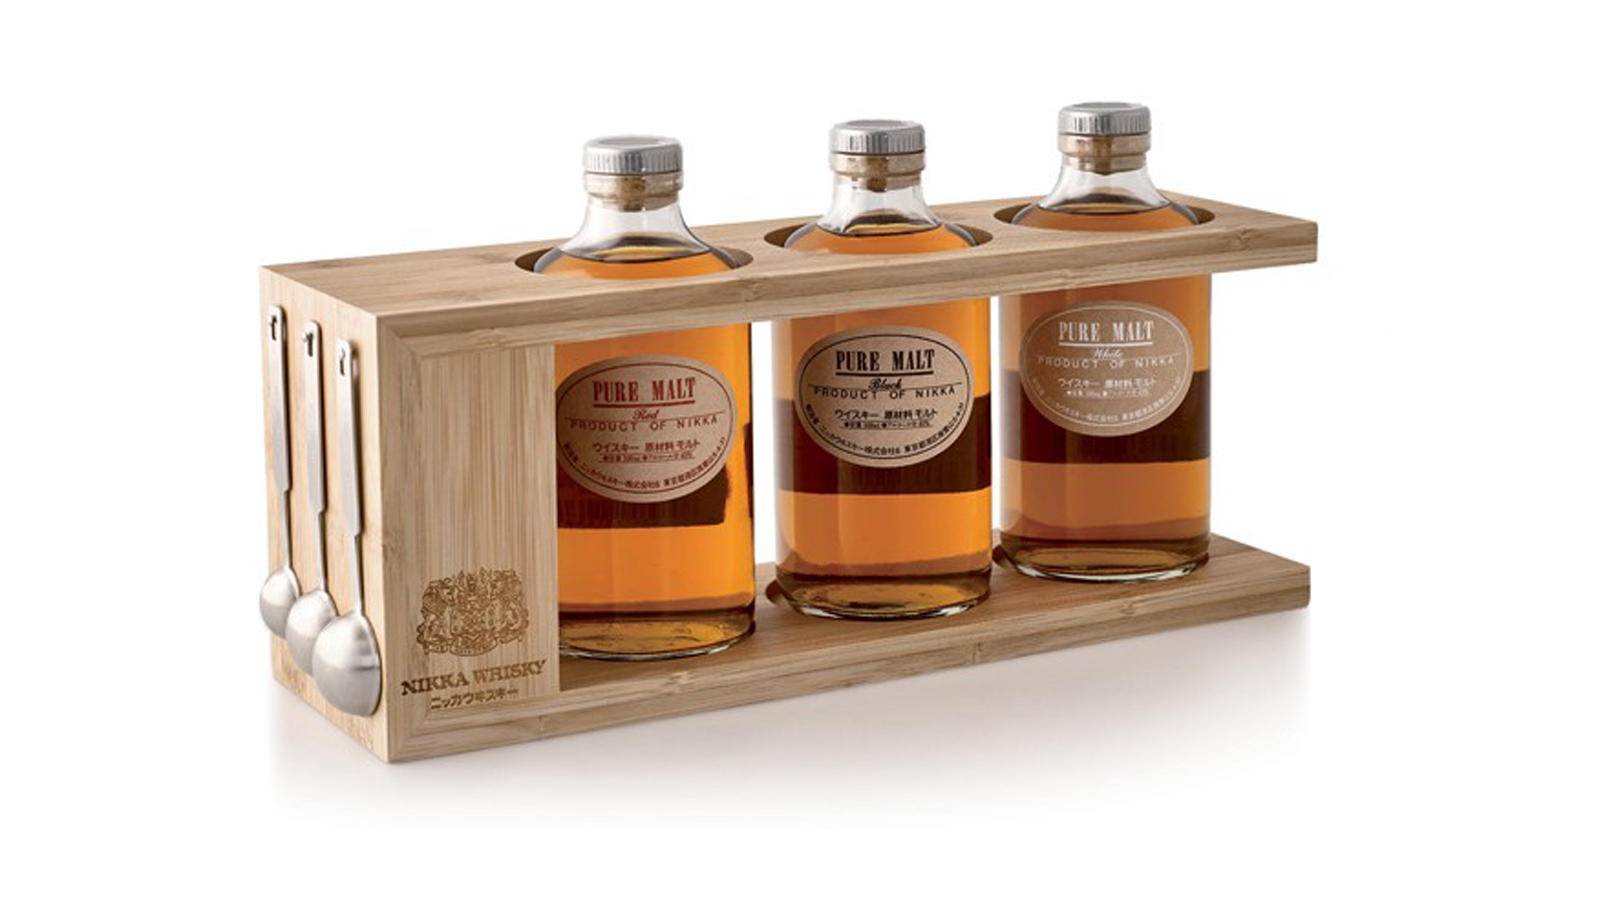 1-2S_nikka whisky-Design-Packaging copie.jpg